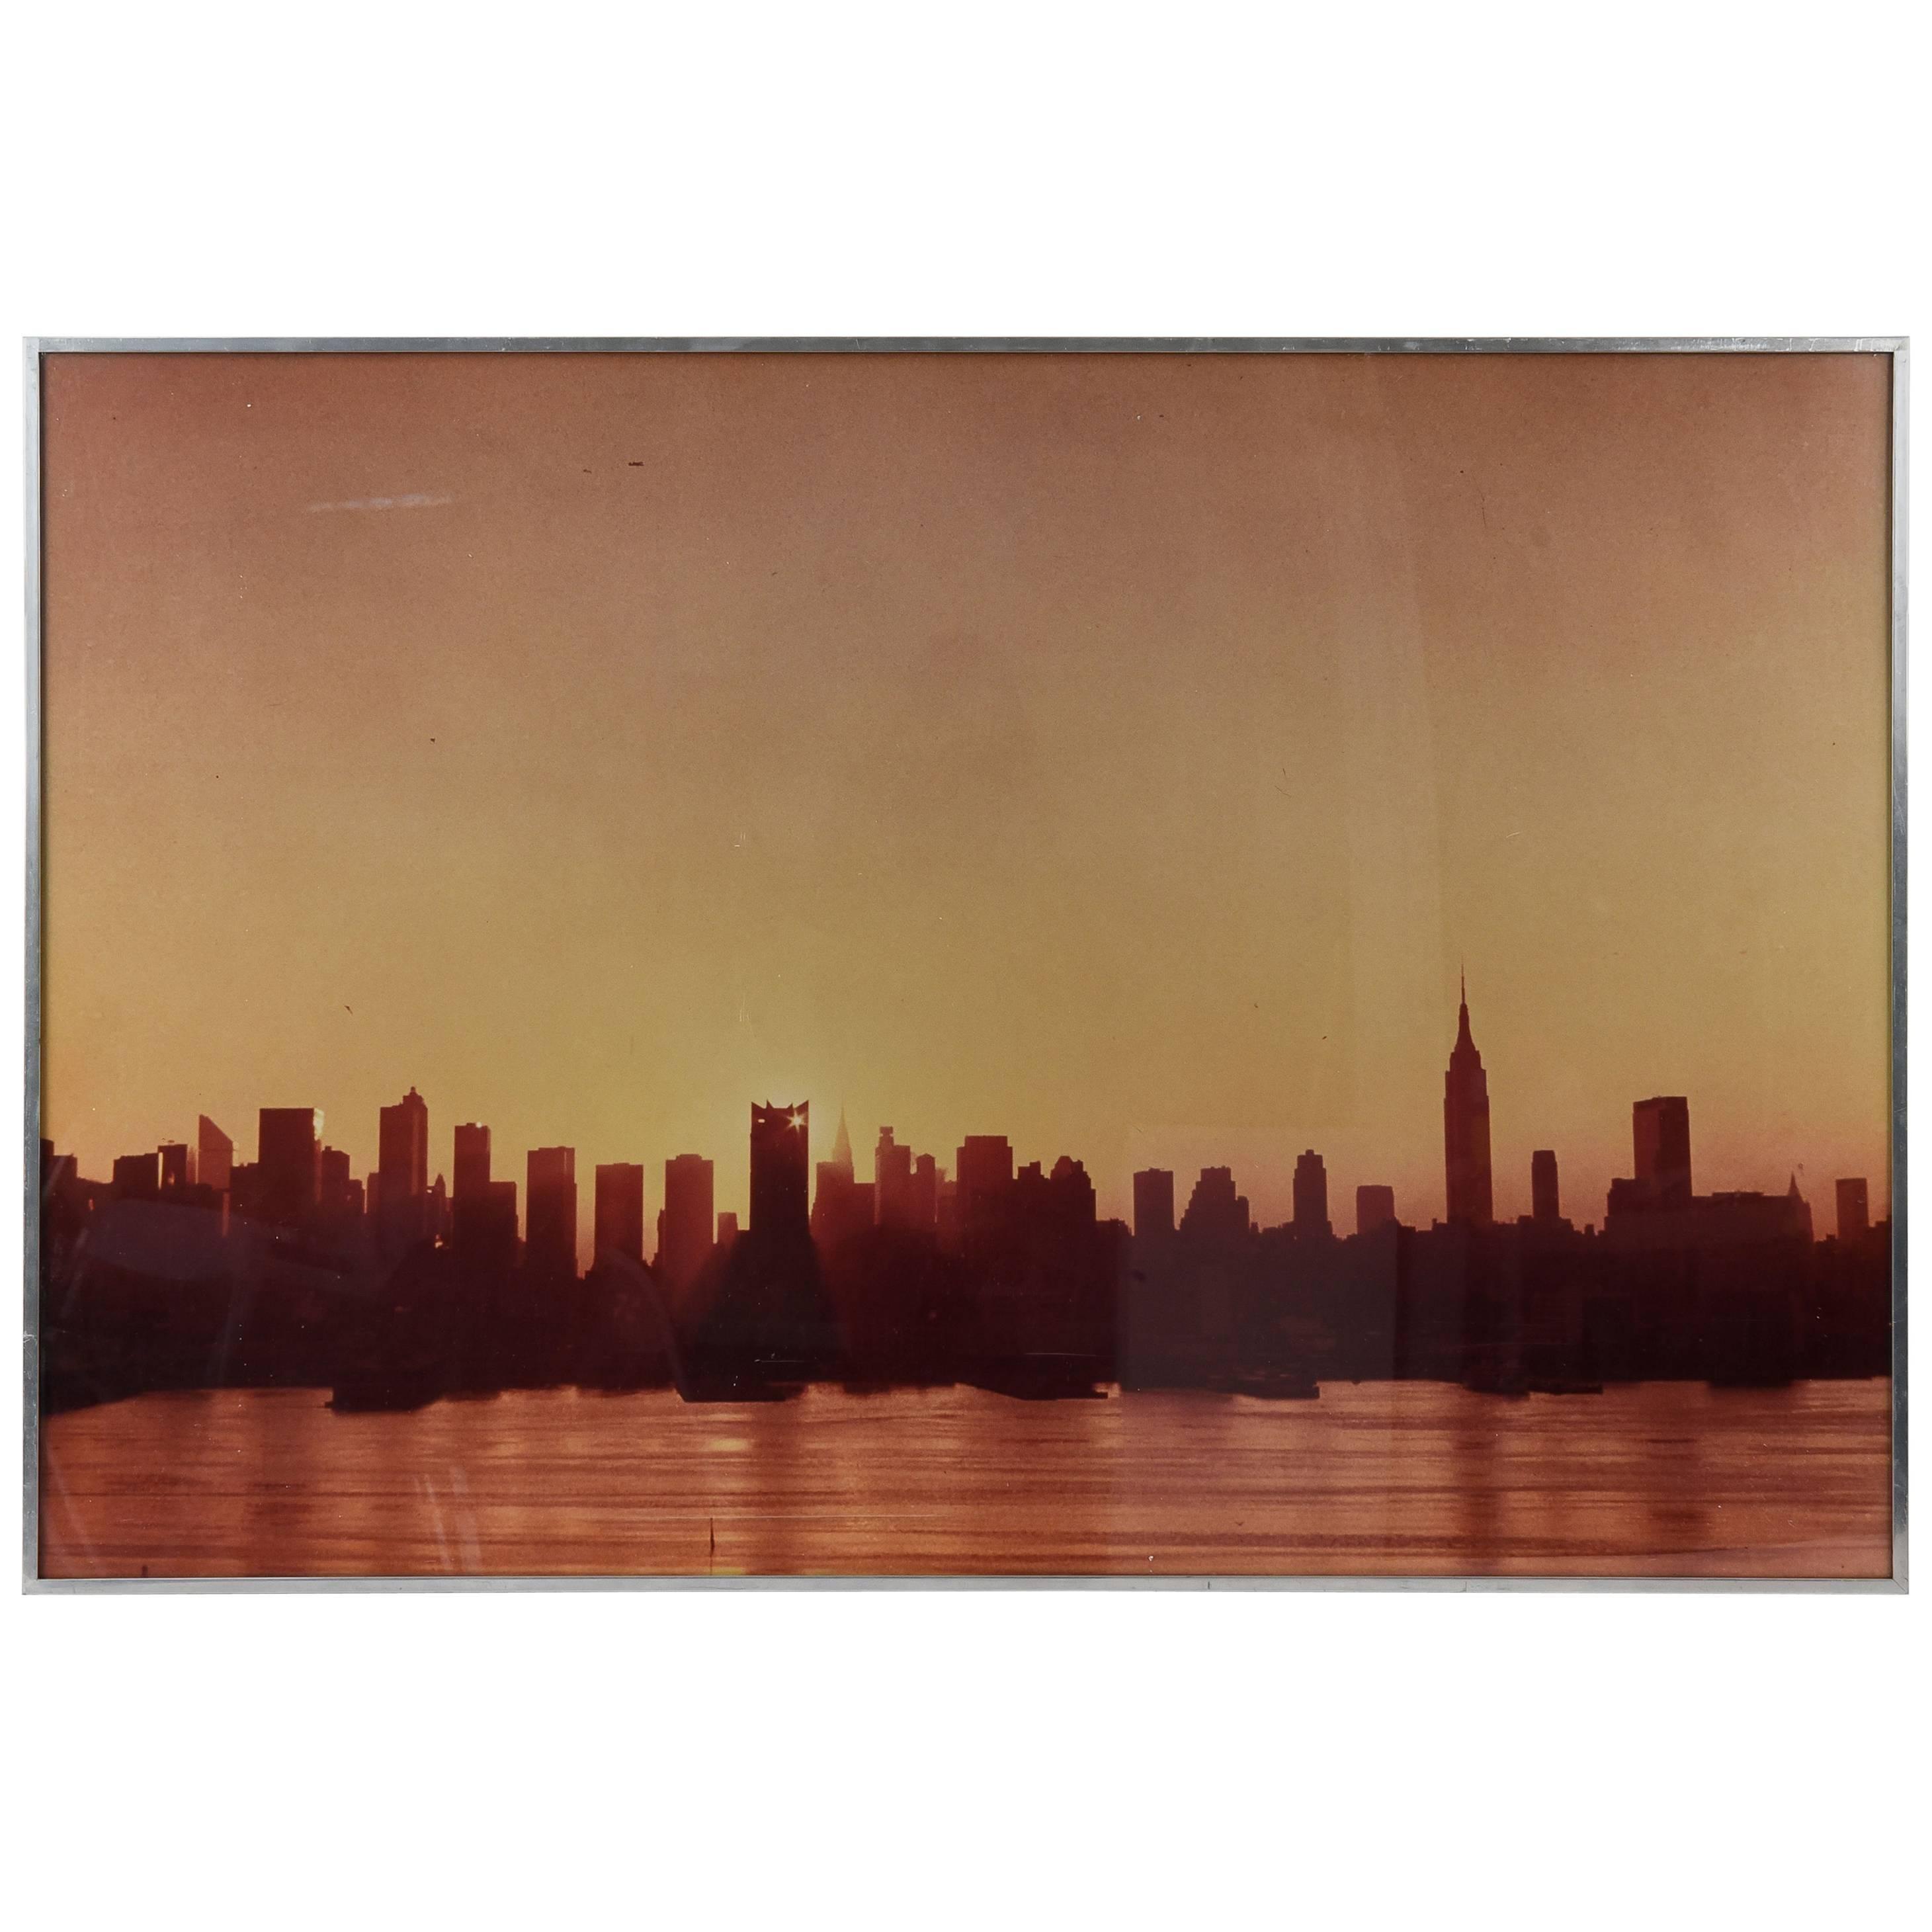 New York City Sunset or Sunrise Skyline Portrait